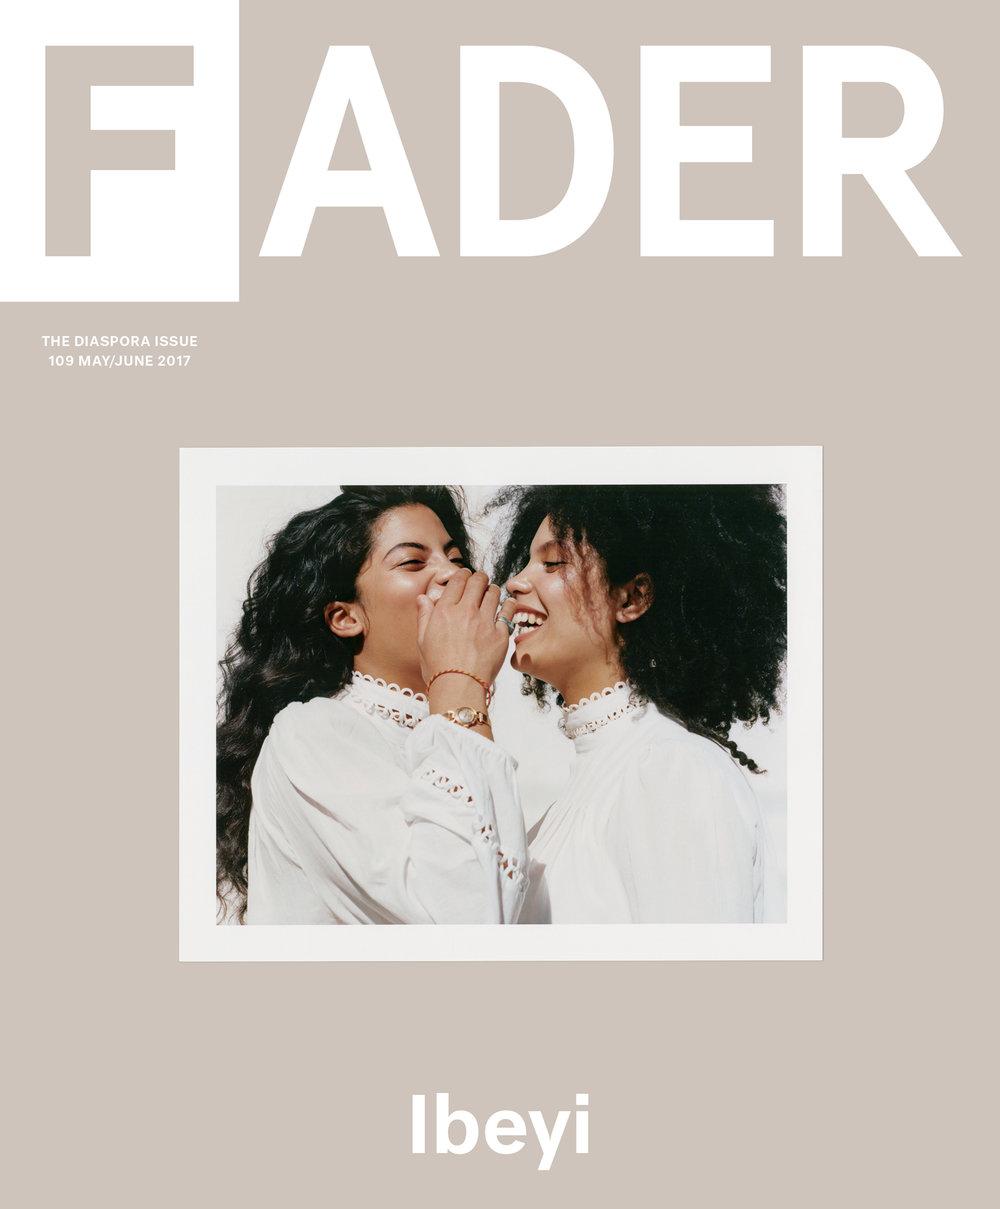 amber_mahoney_ibeyi_the_fader_cover_diaspora_001.jpg